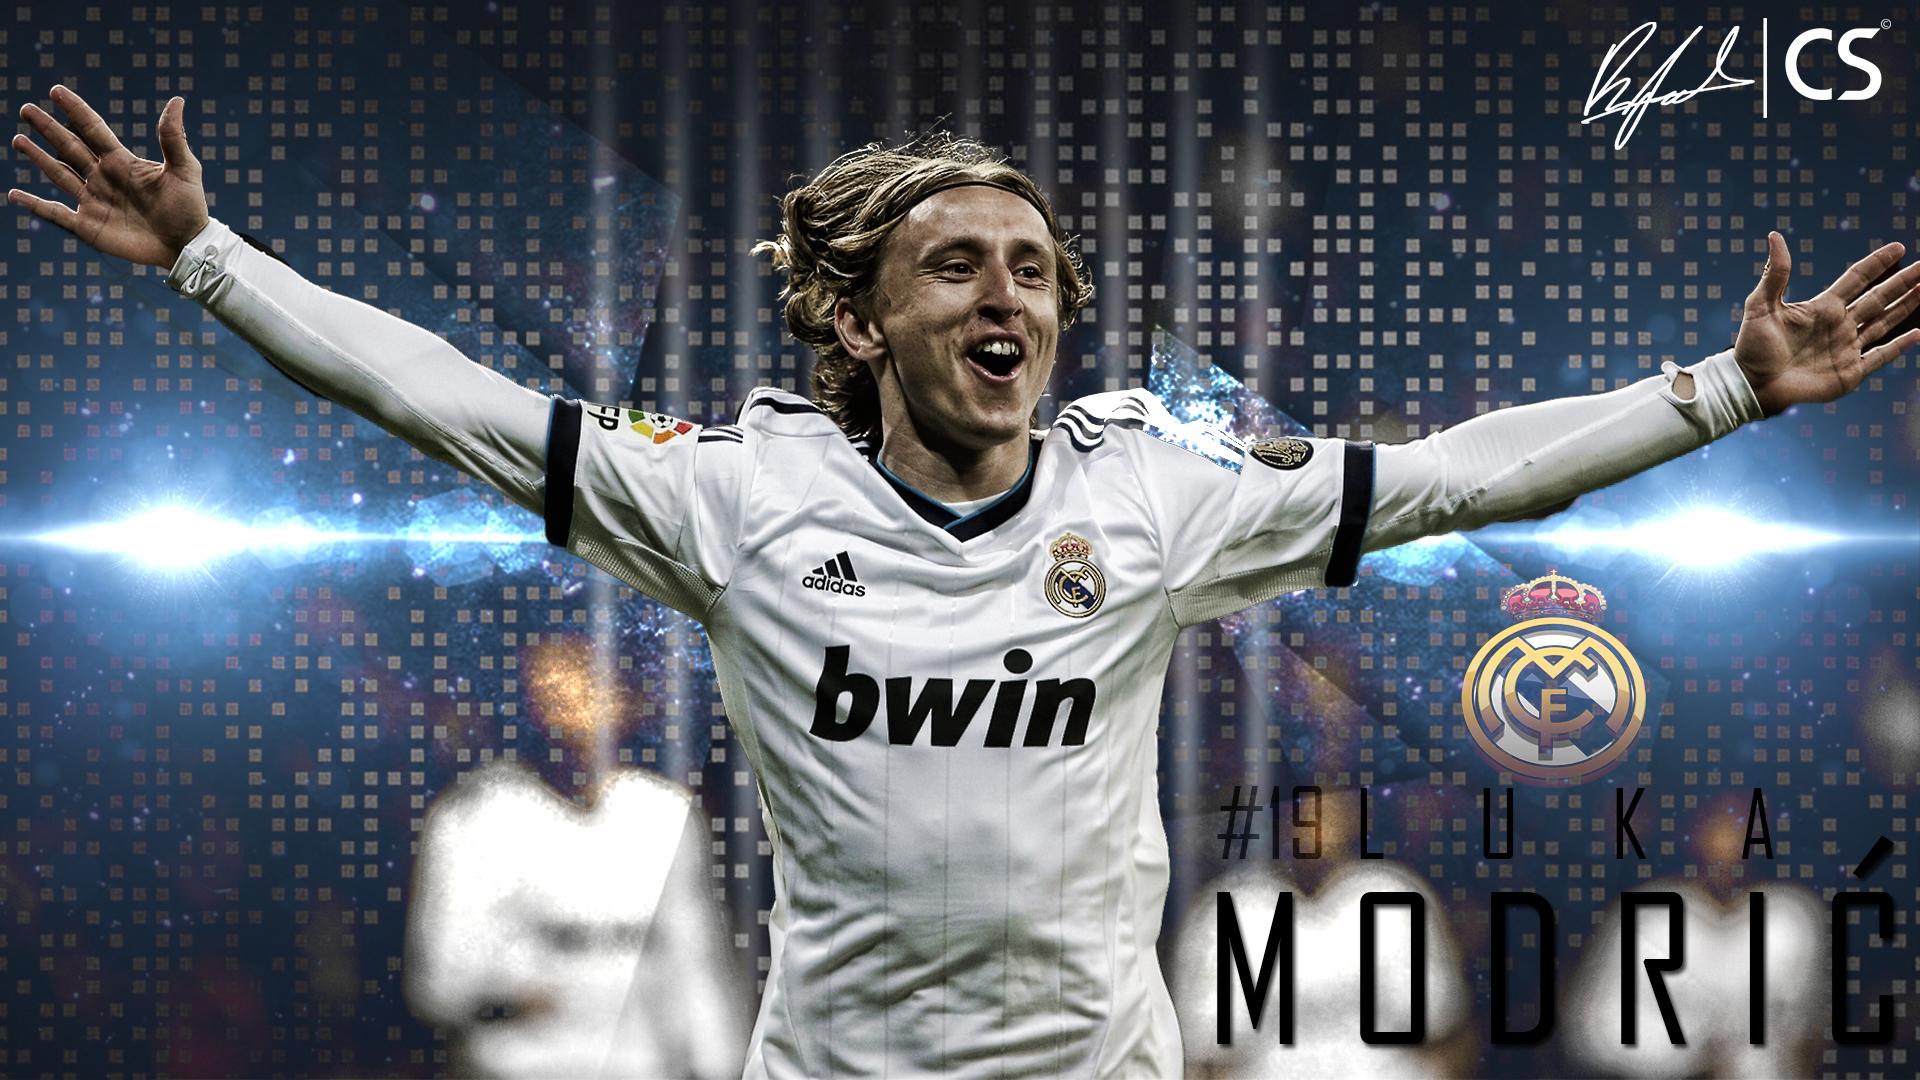 Luka Modric Images